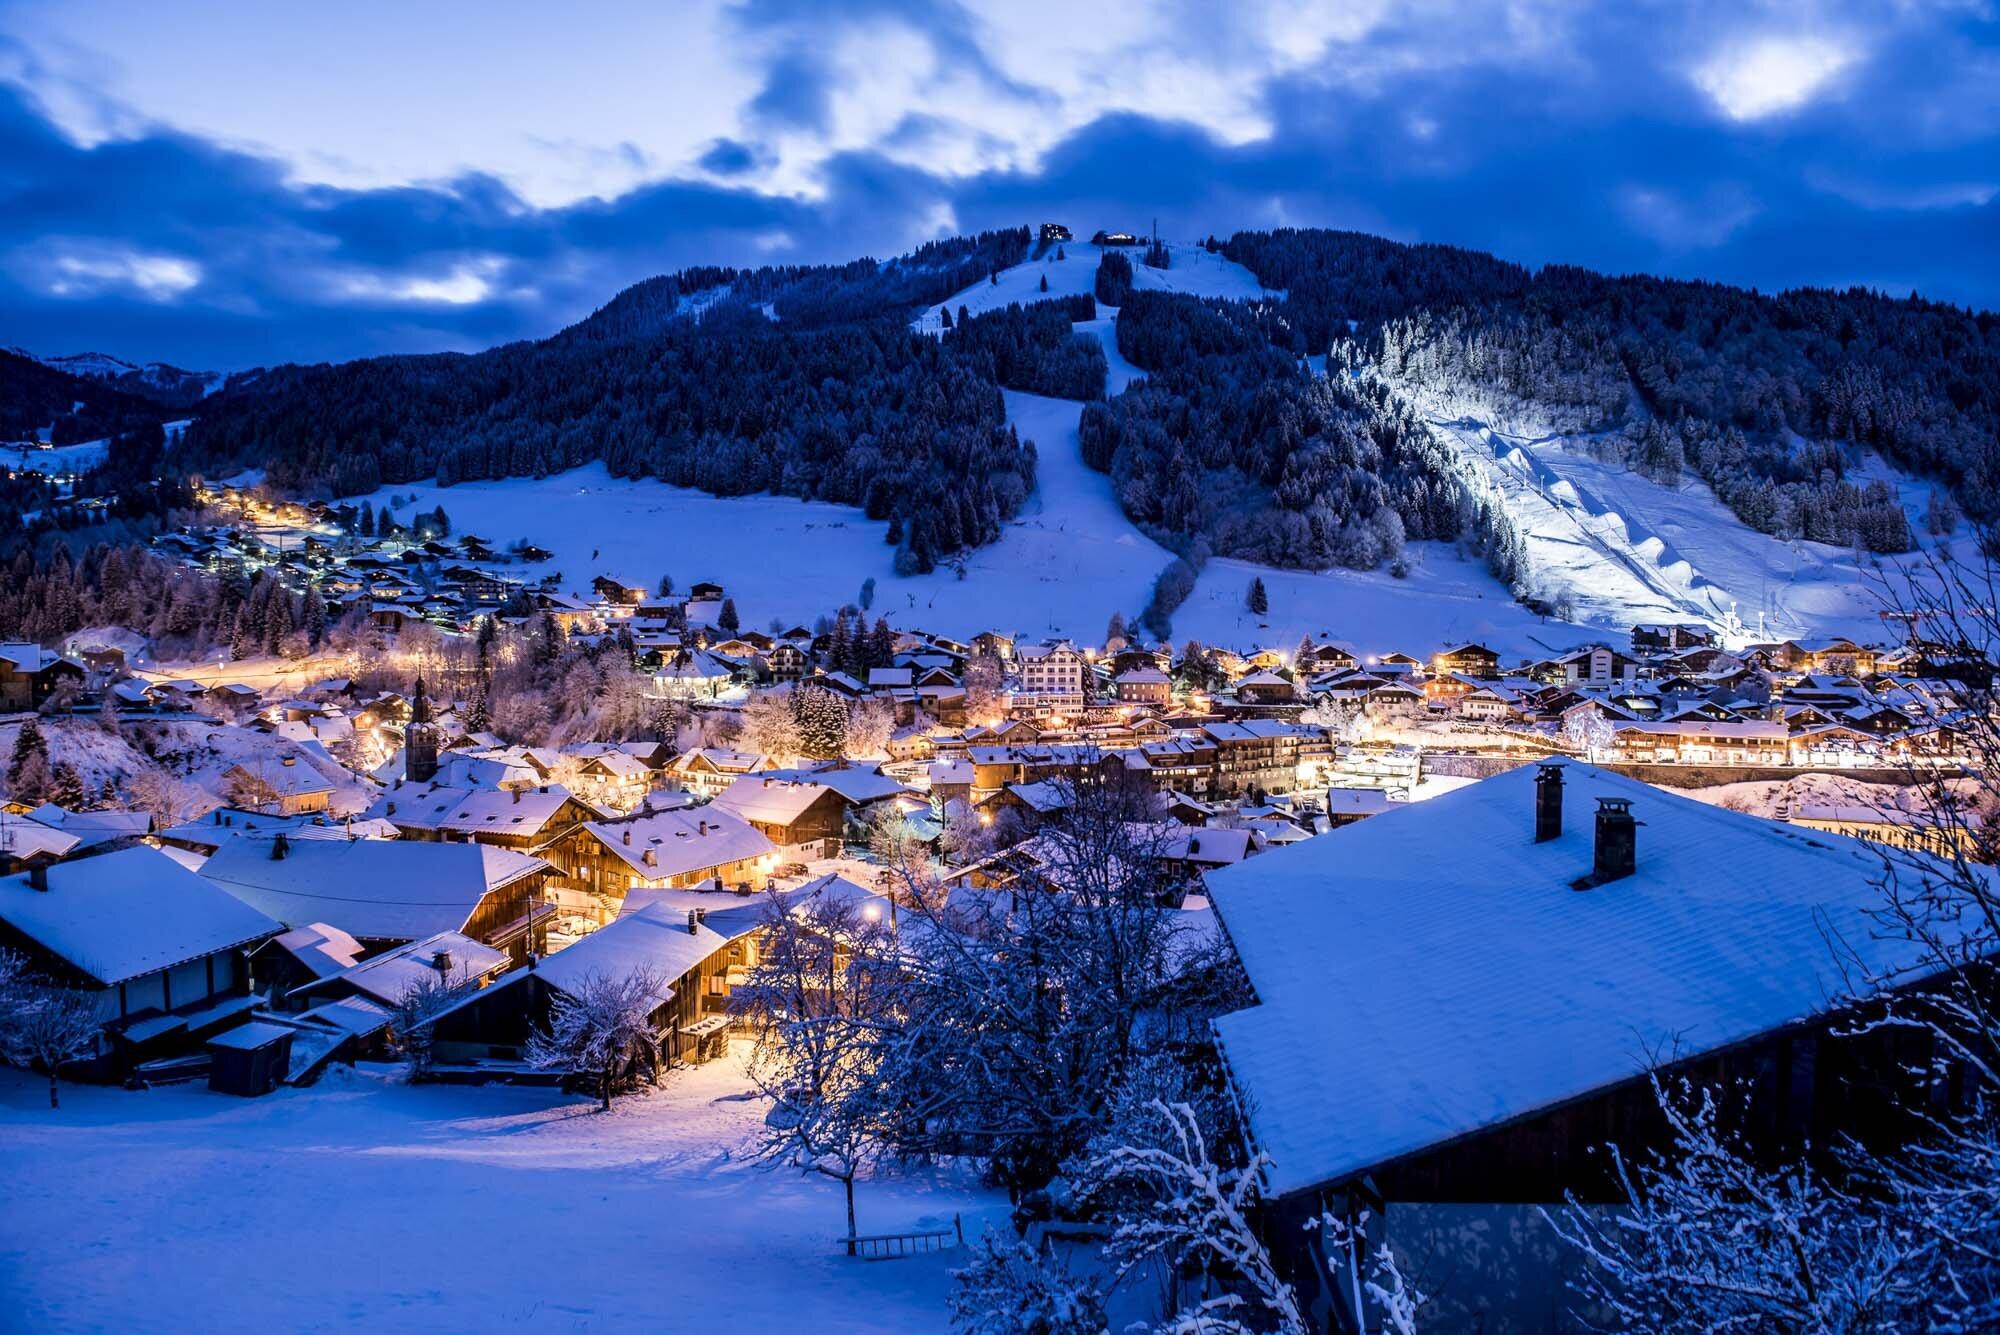 ski-chalet-holiday-mountains-landscape-tgski-037.jpg